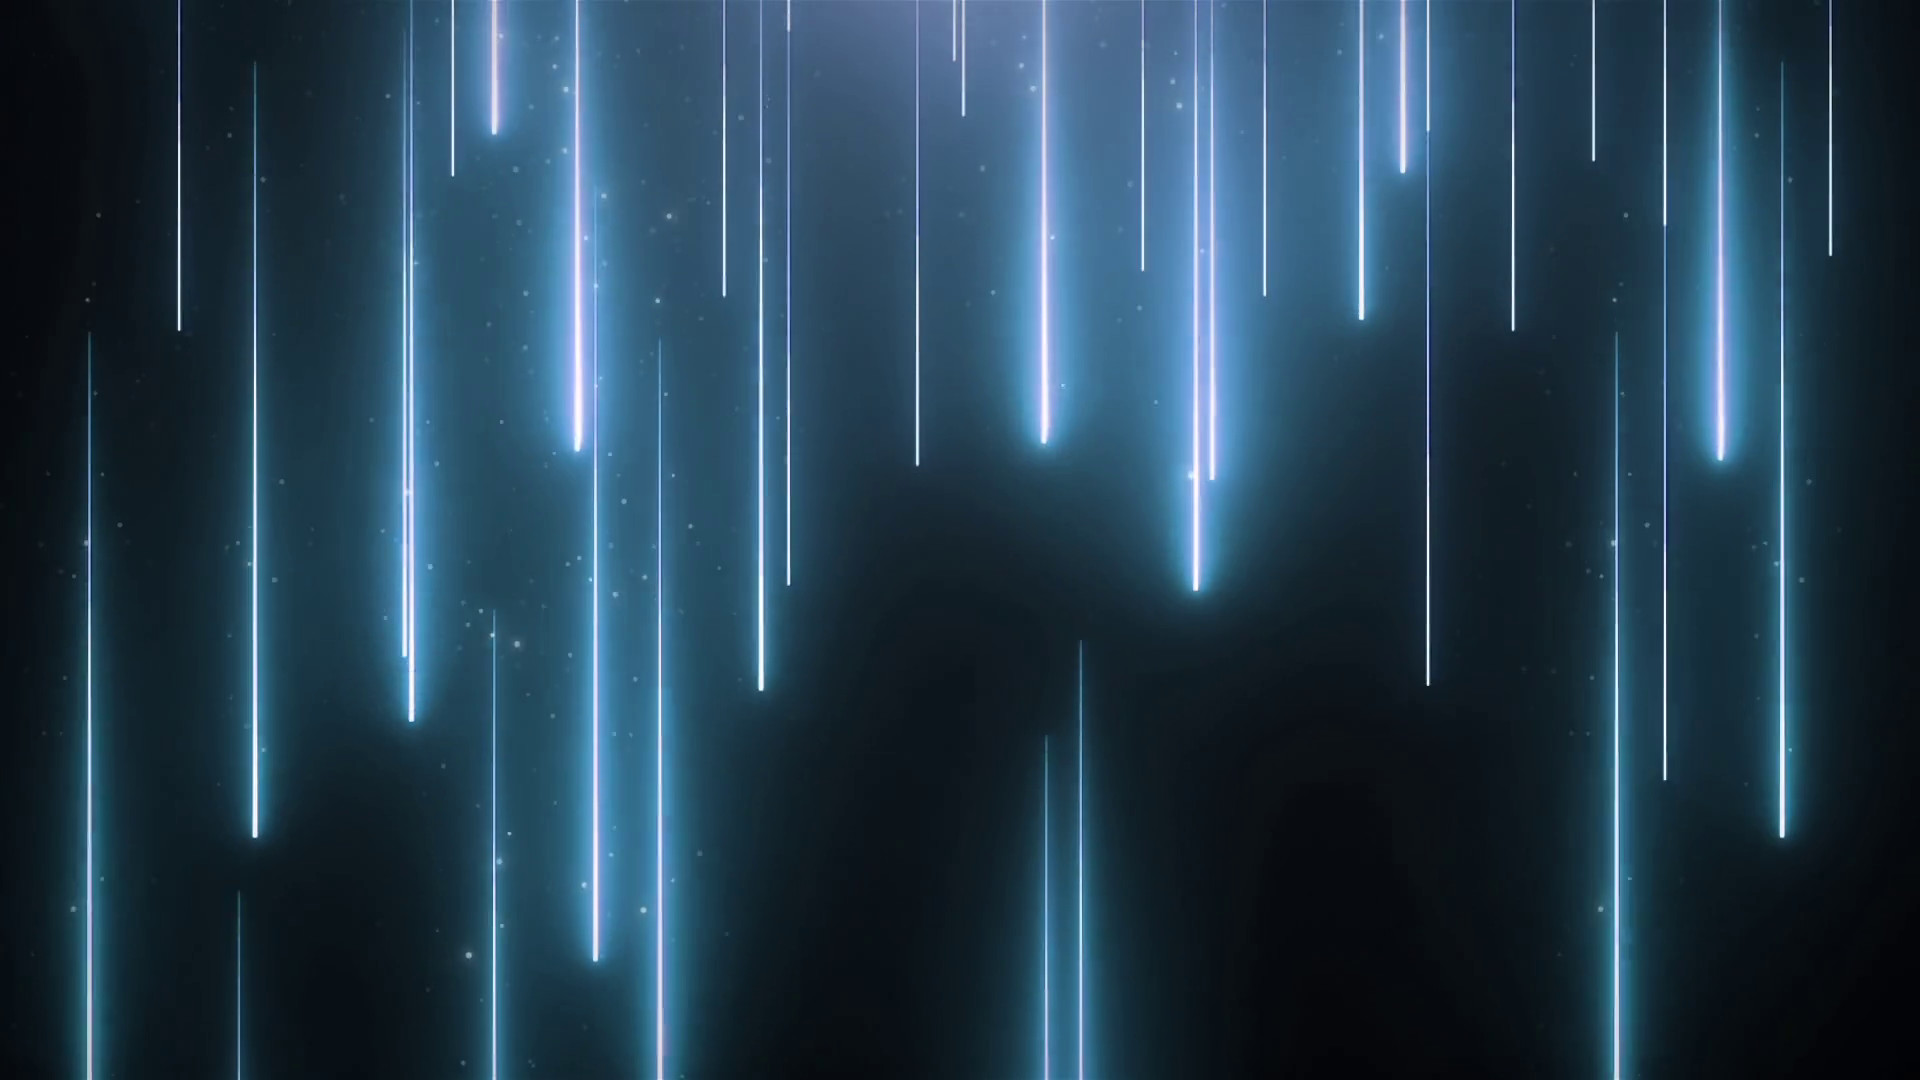 Blue neon background wallpapertag - Wallpaper blue neon ...